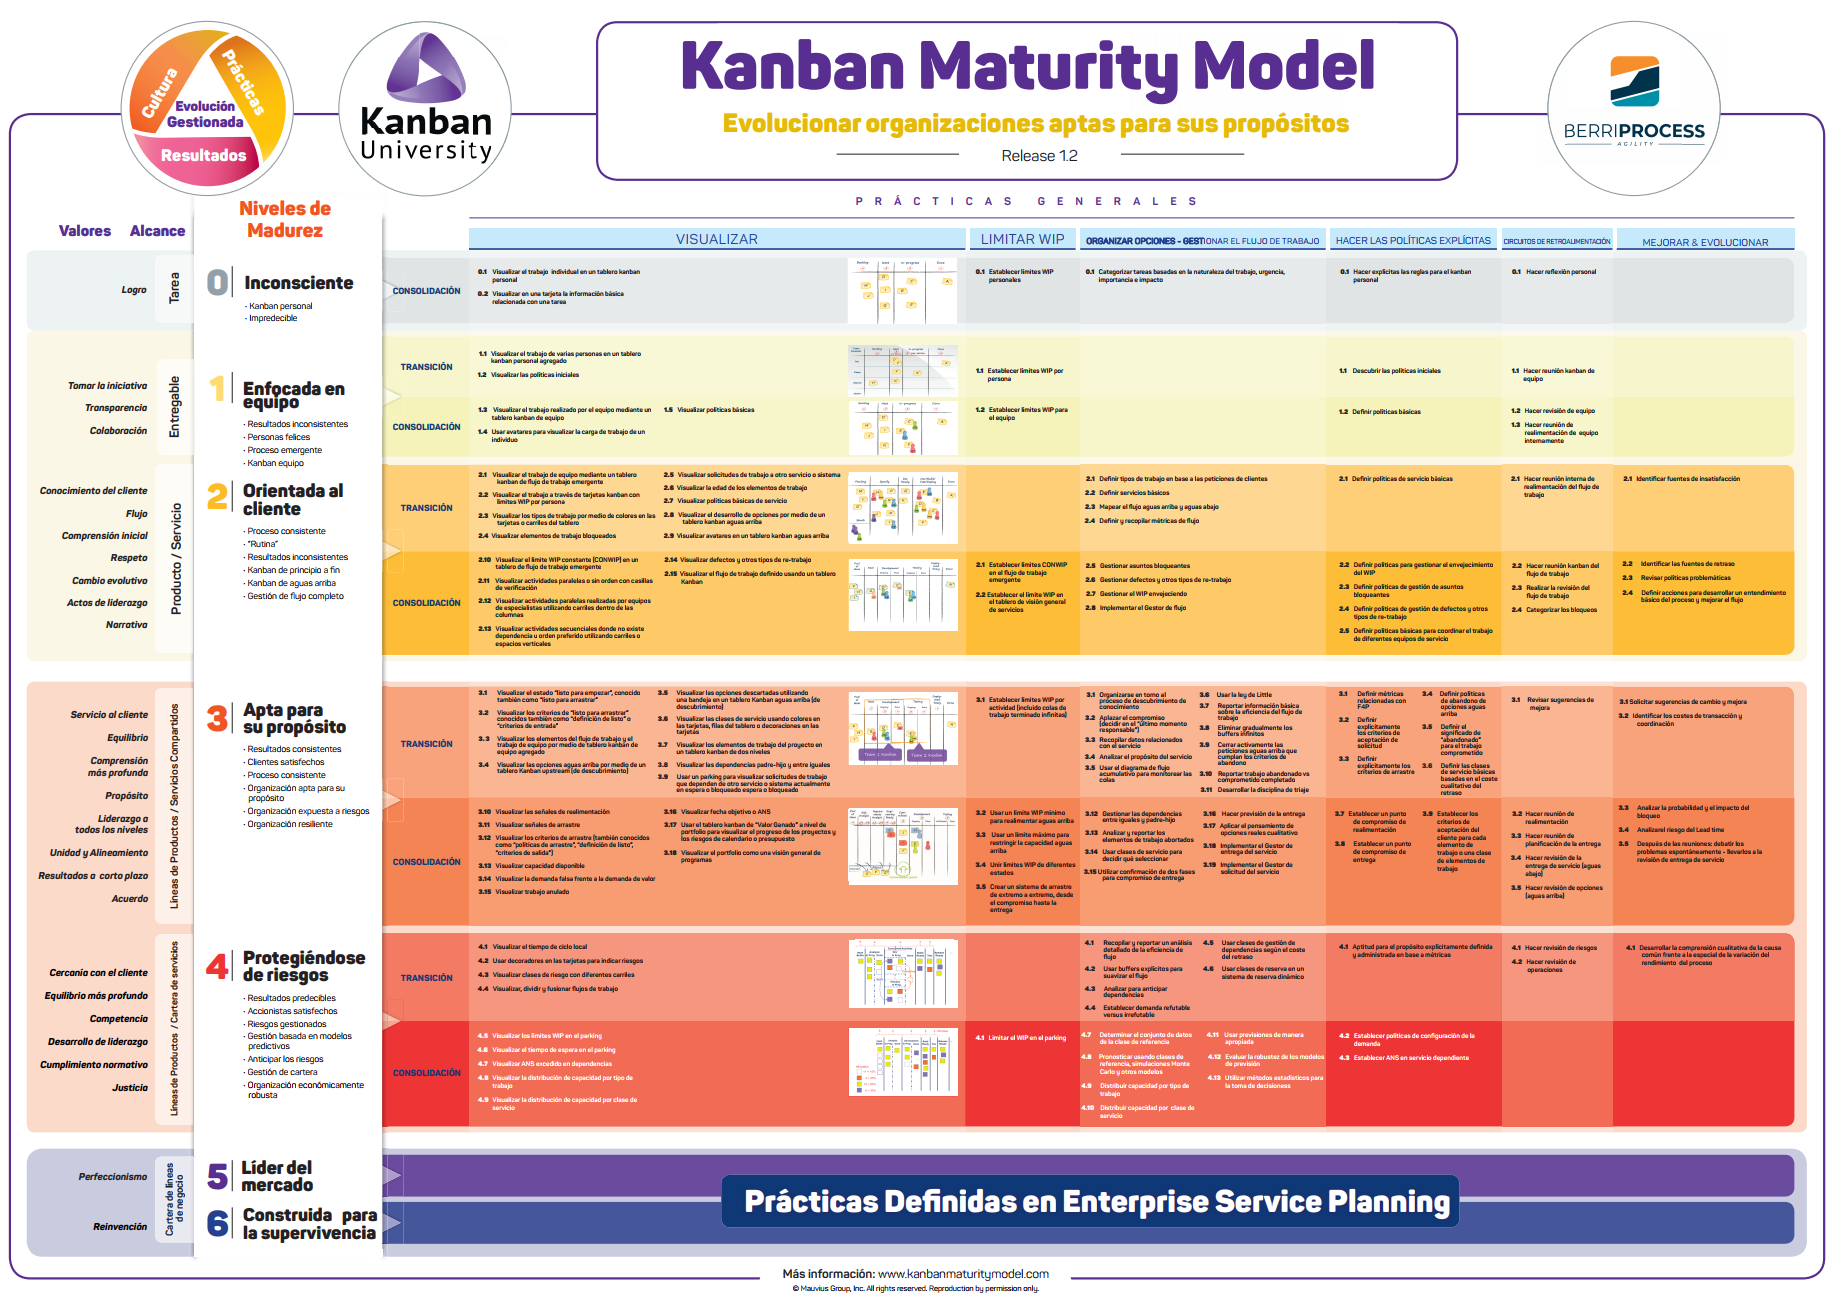 KMM Kanban Maturity Model